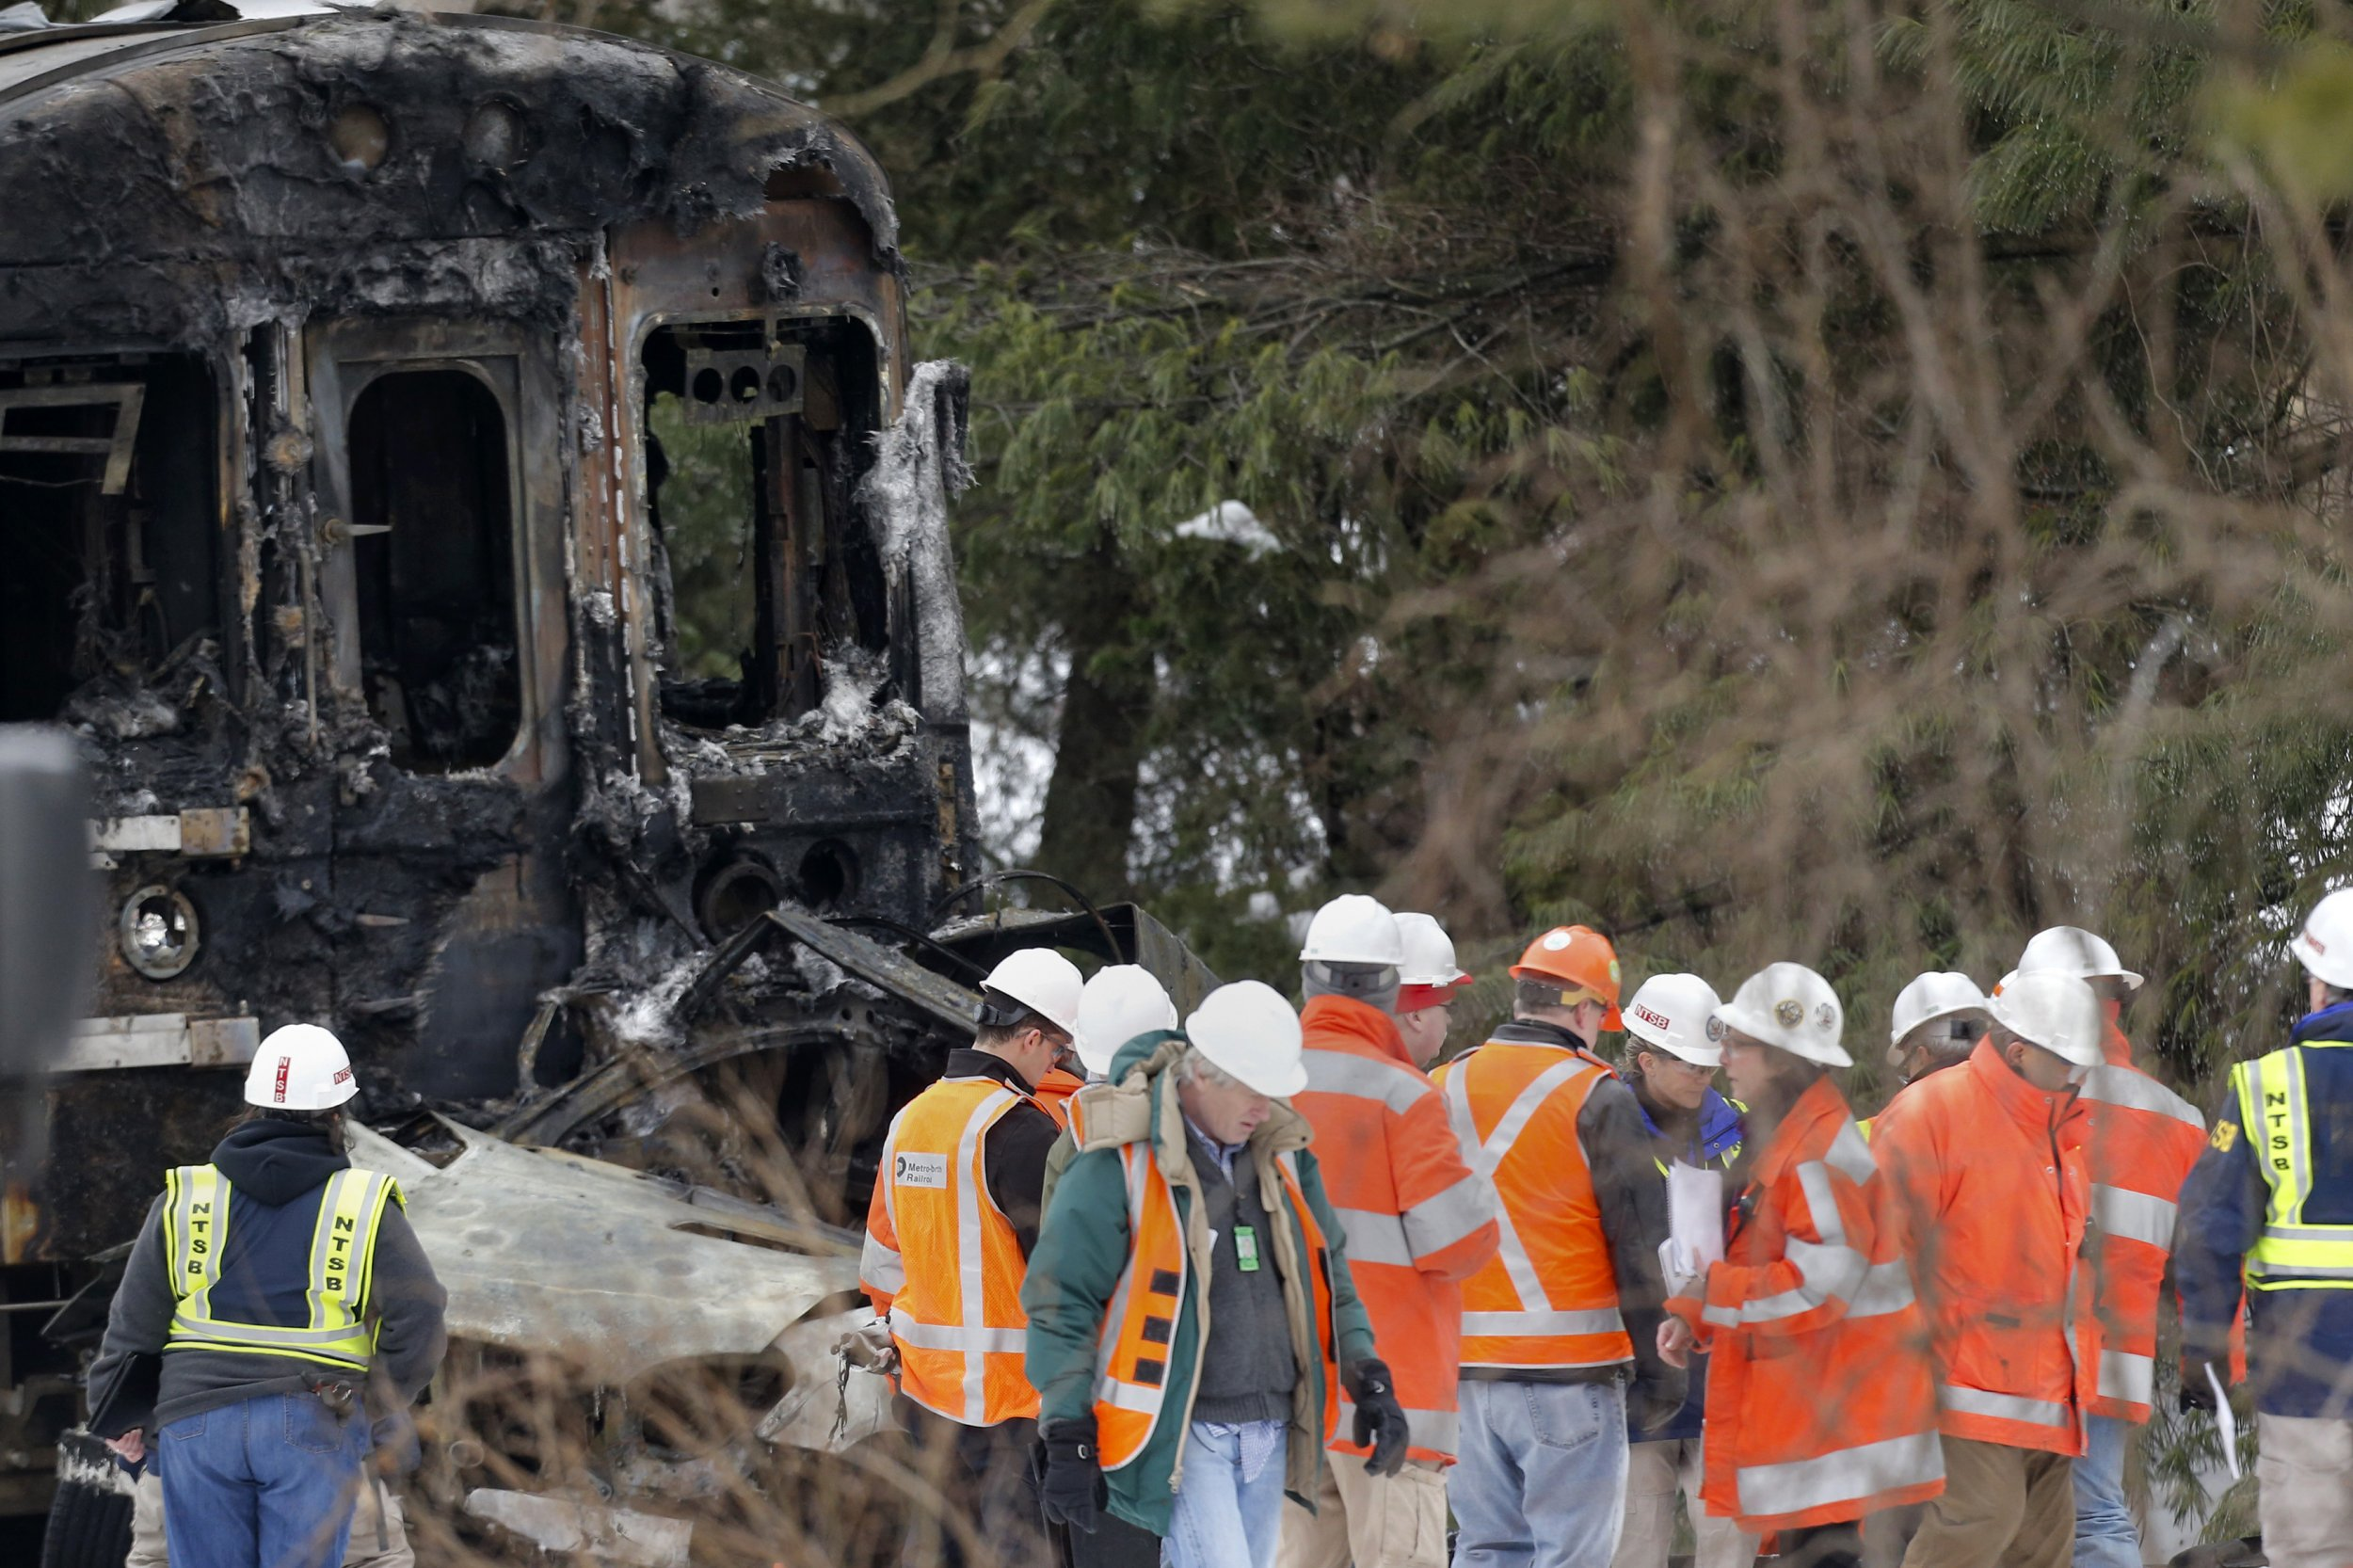 Train Safety Statistics: Are Railroads Dangerous?